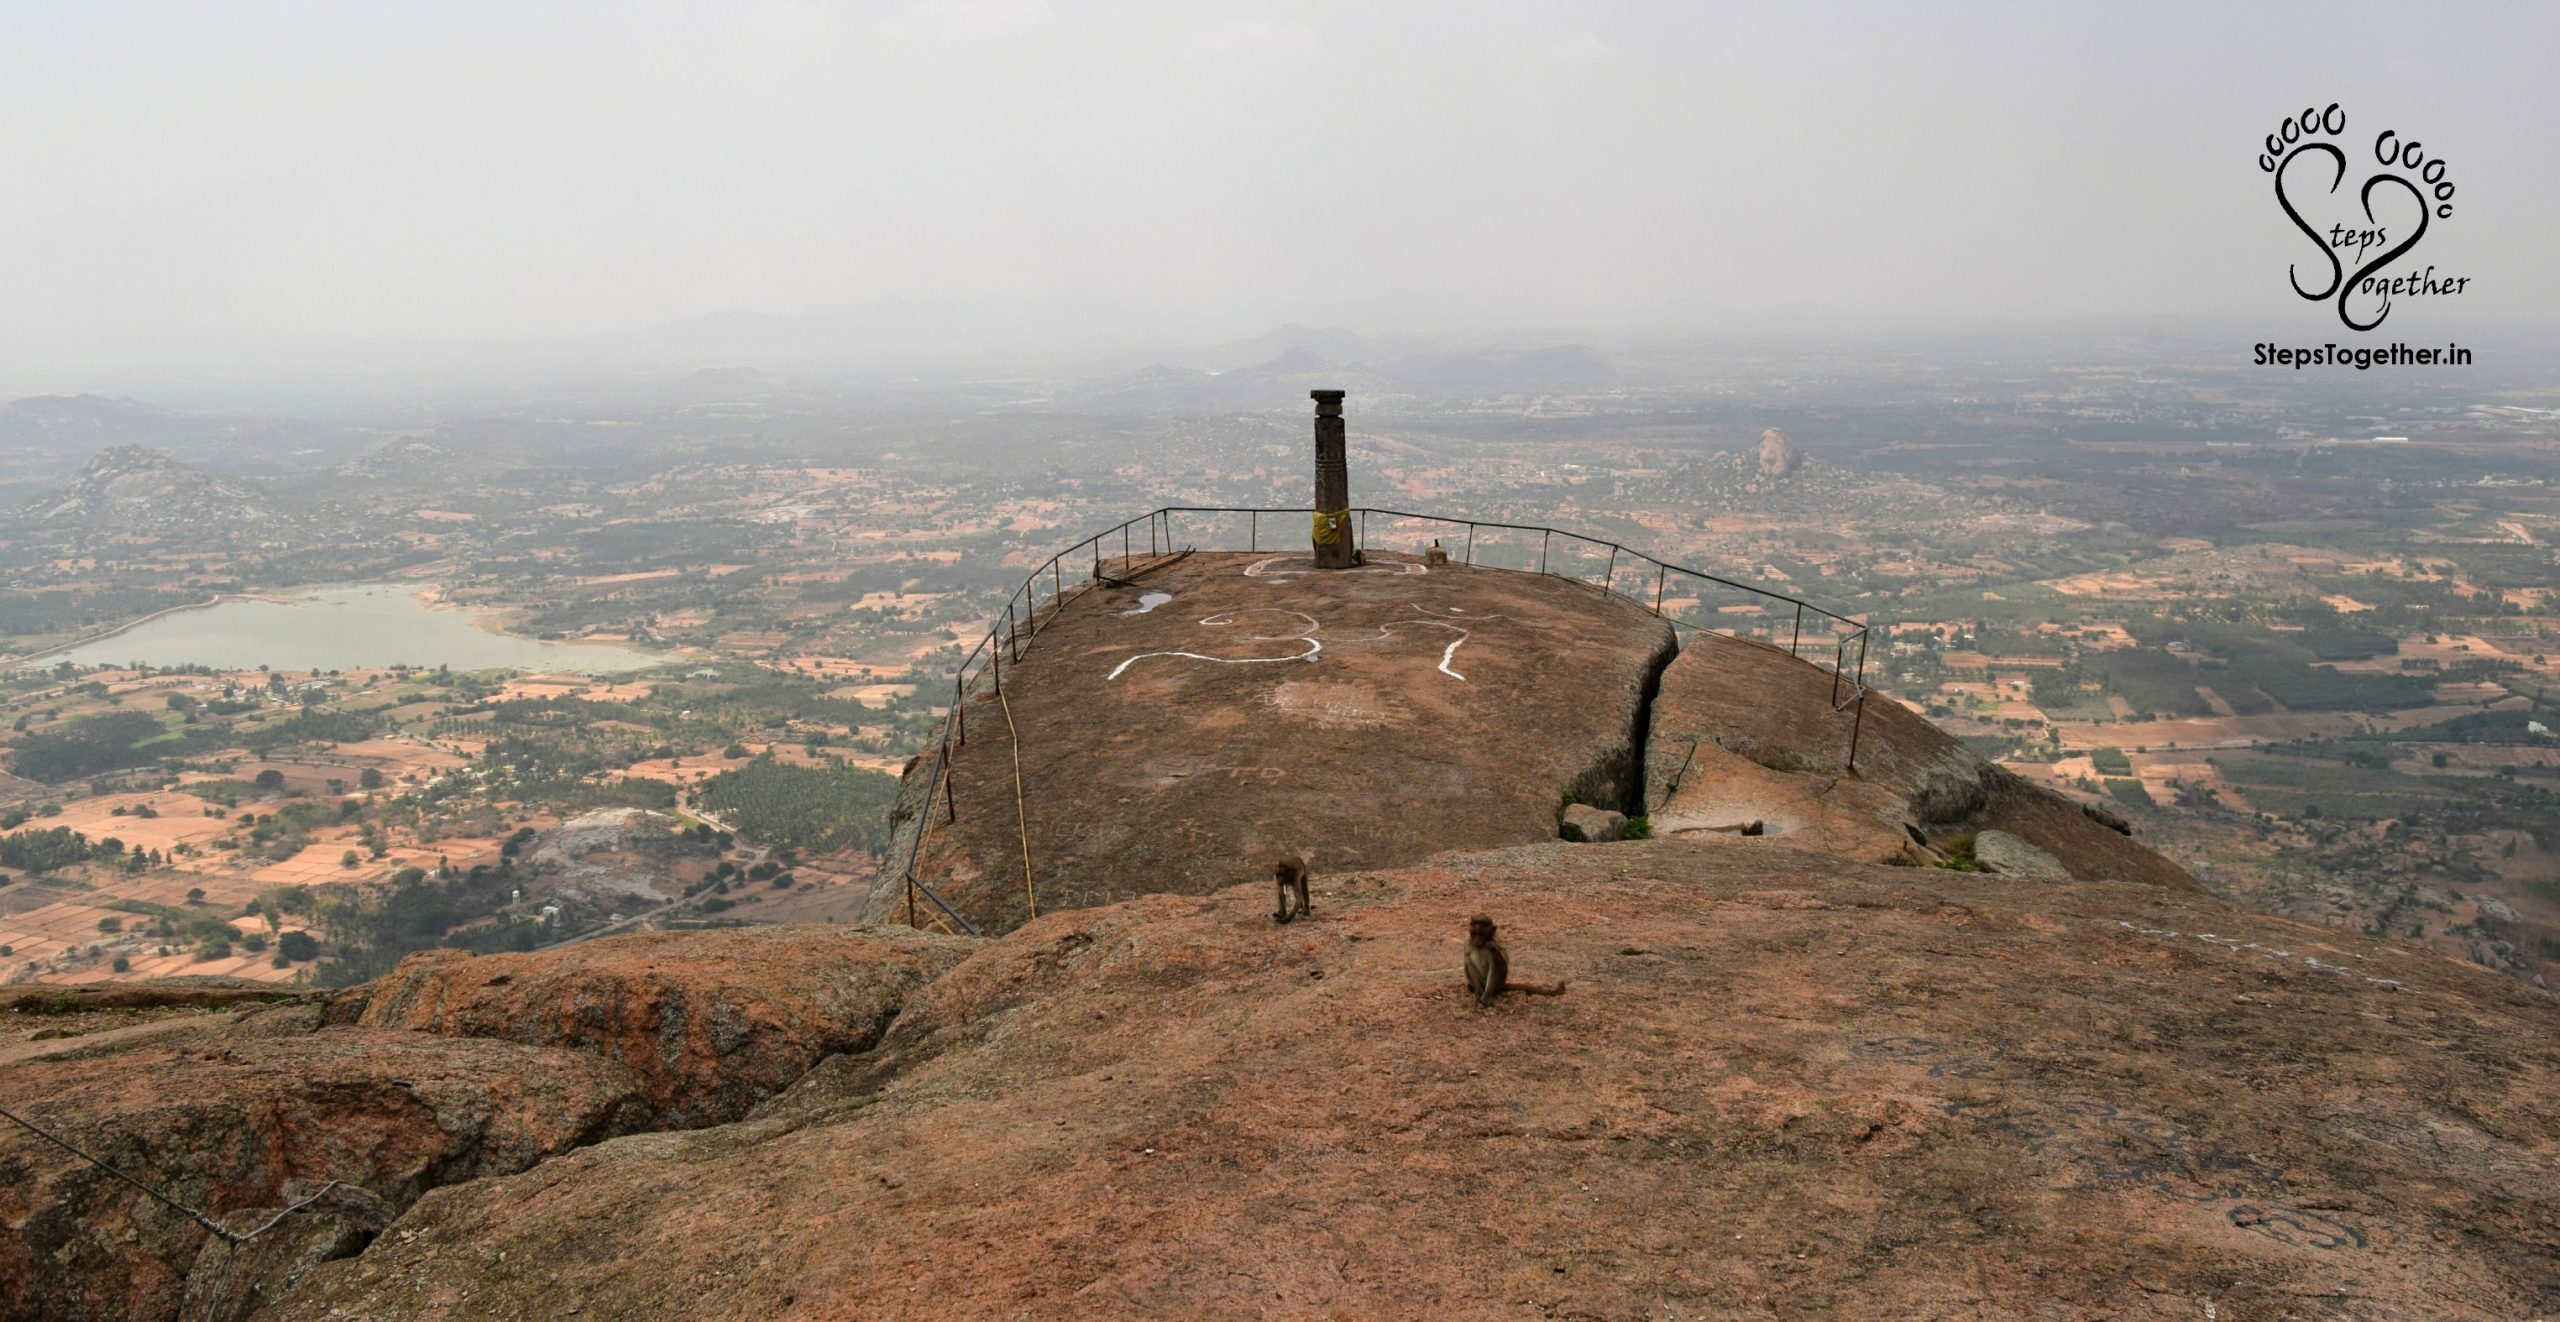 Shanthala Point